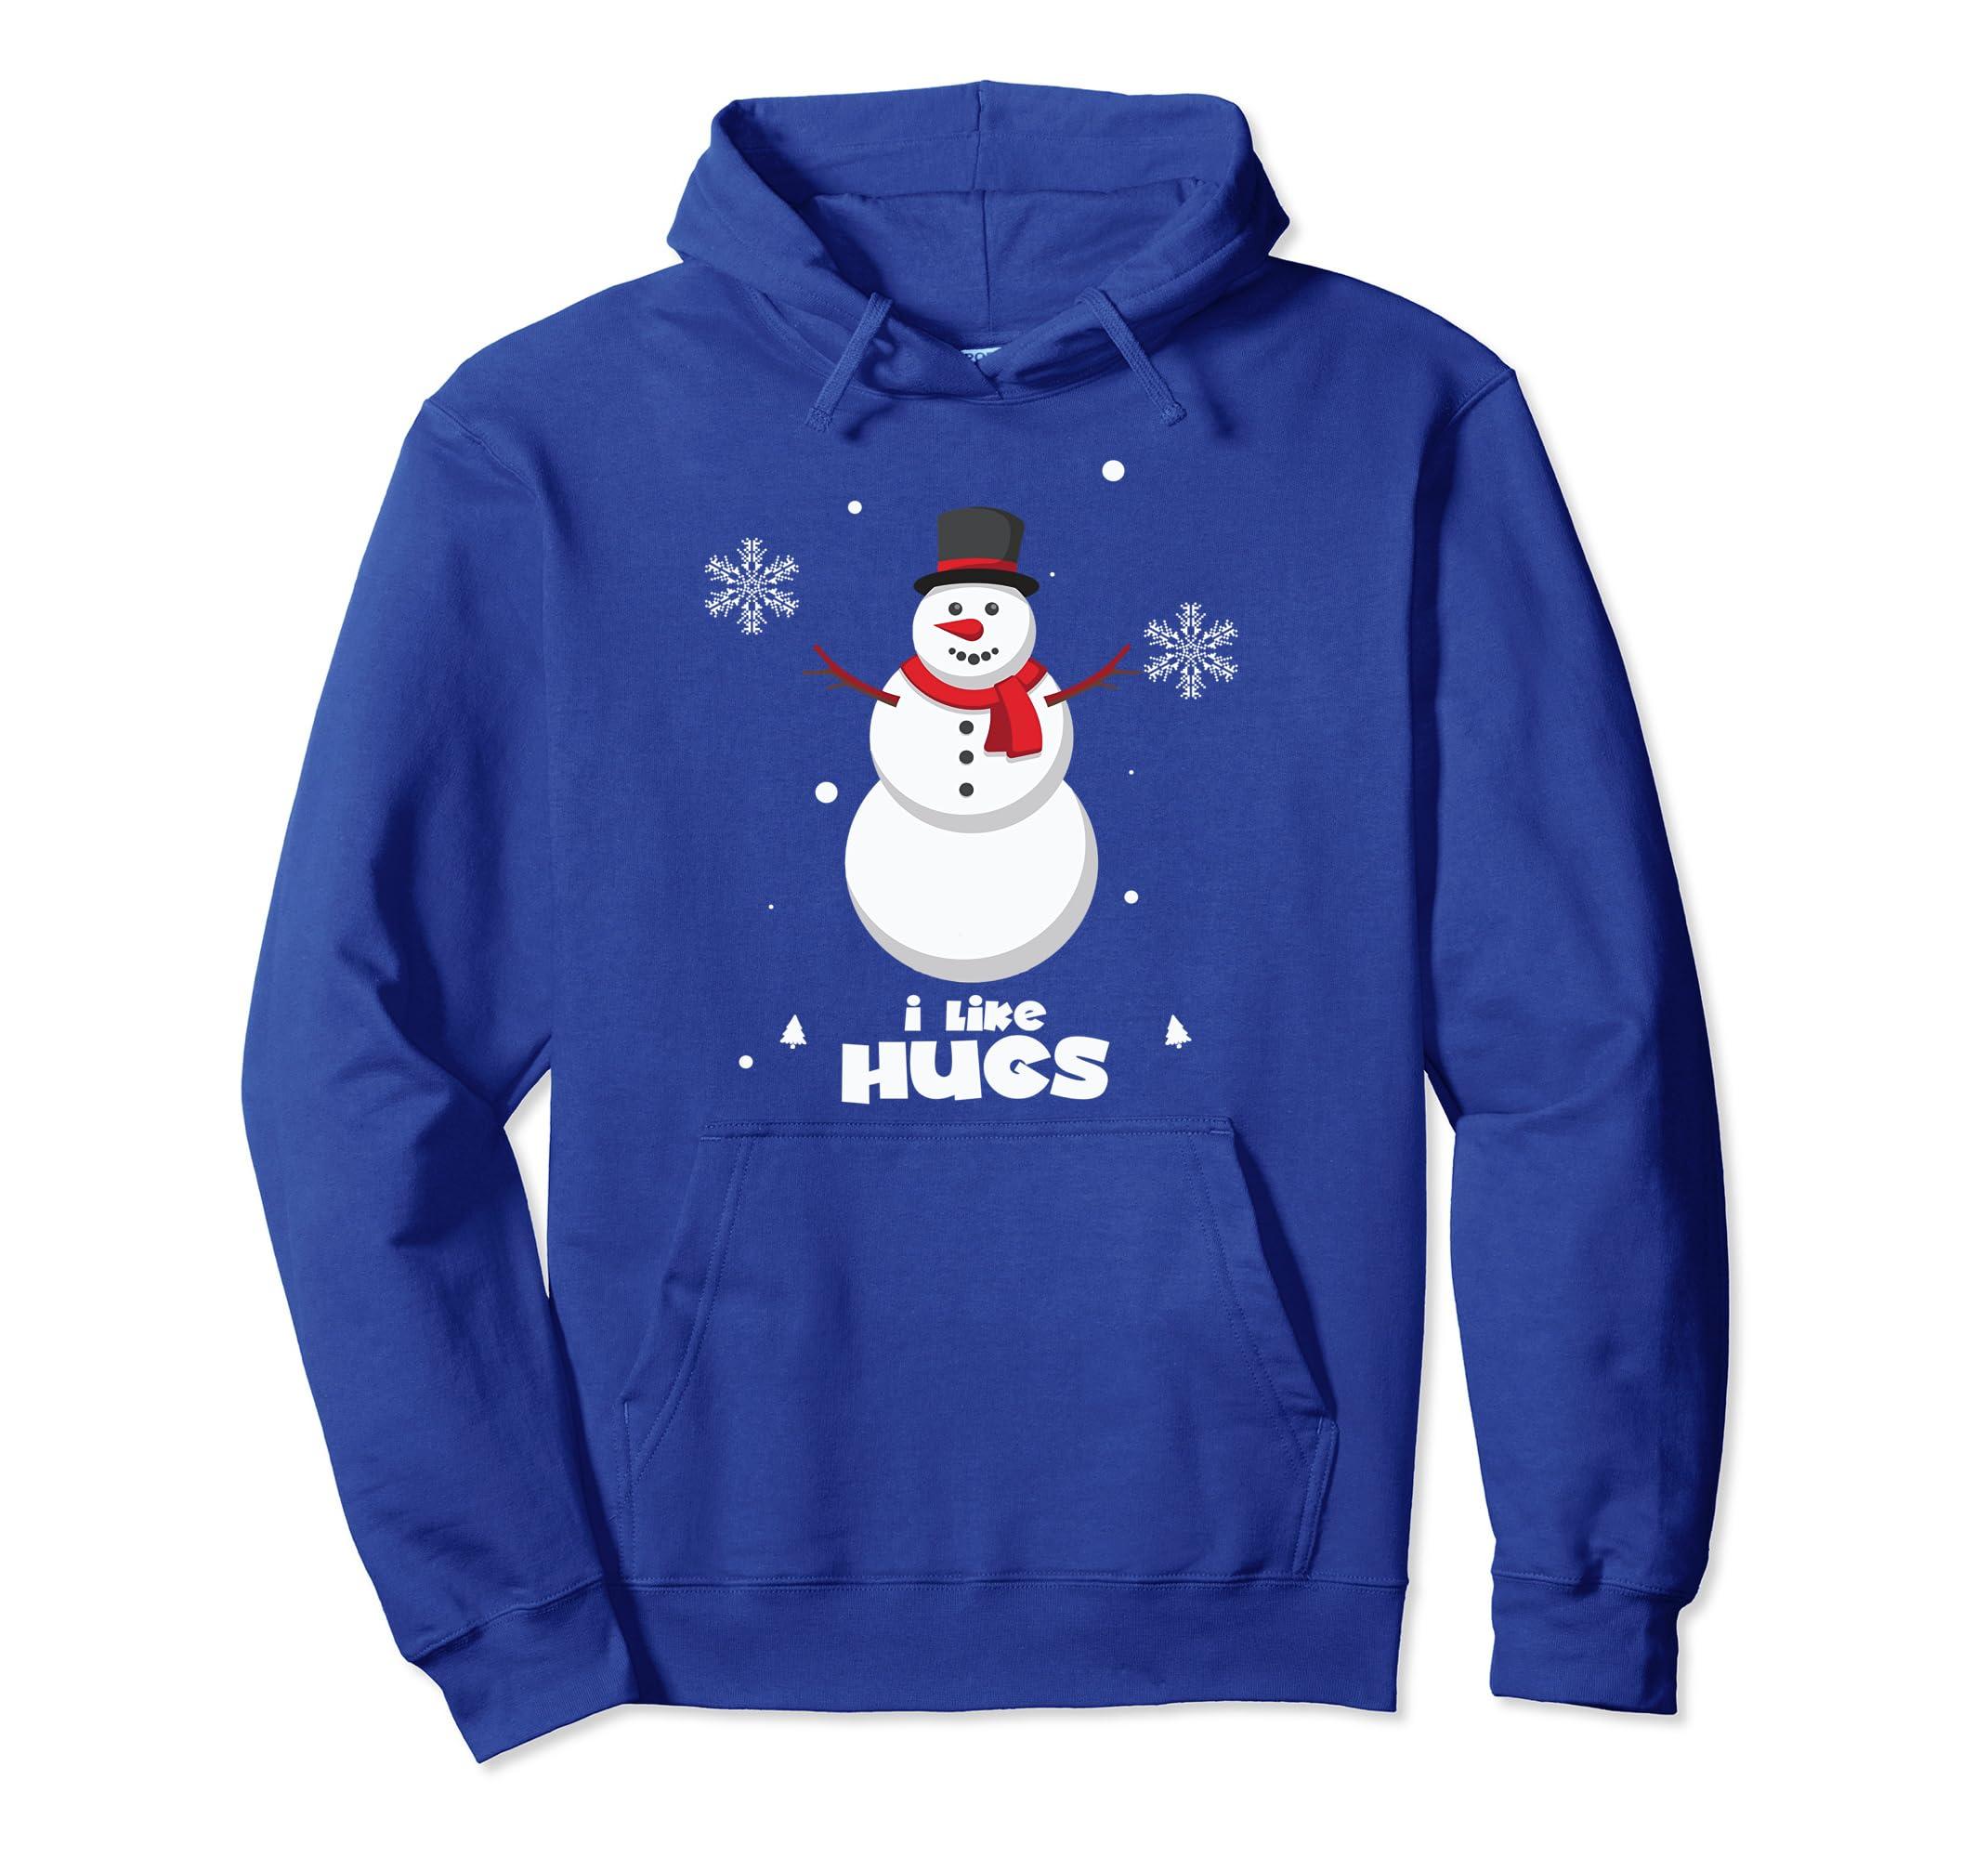 Snowman Christmas Hoodie Xmas Gifts